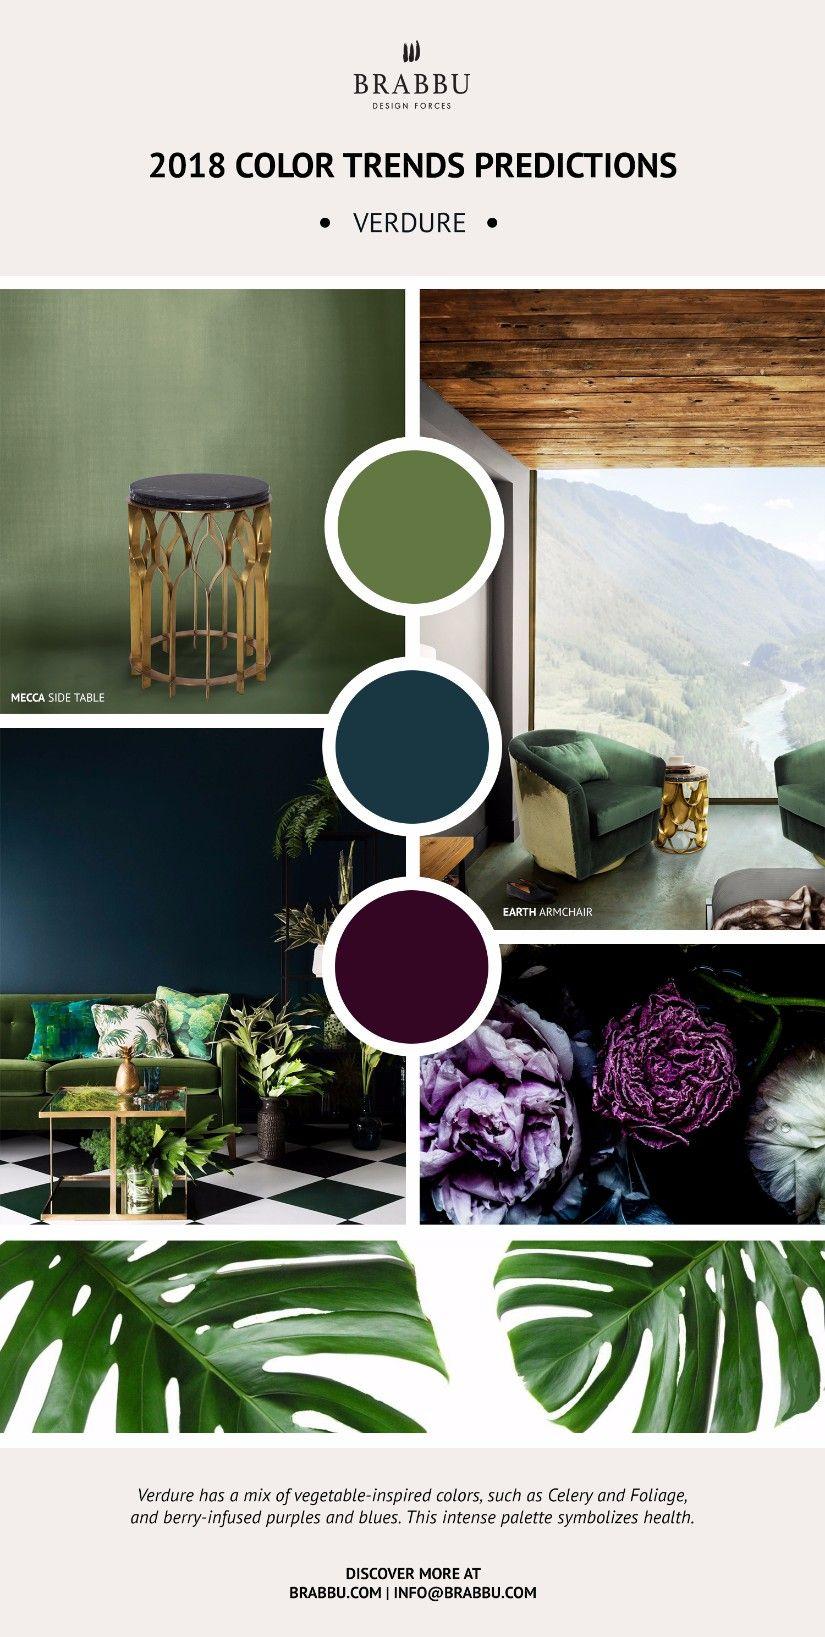 Trend Alert! Here Are The 2018 Color Trends Predictions // Home Decor. Interior Design. #colors #colortrends #pantone Read more: https://www.brabbu.com/en/inspiration-and-ideas/materials/trend-alert-2018-color-trends-predictions